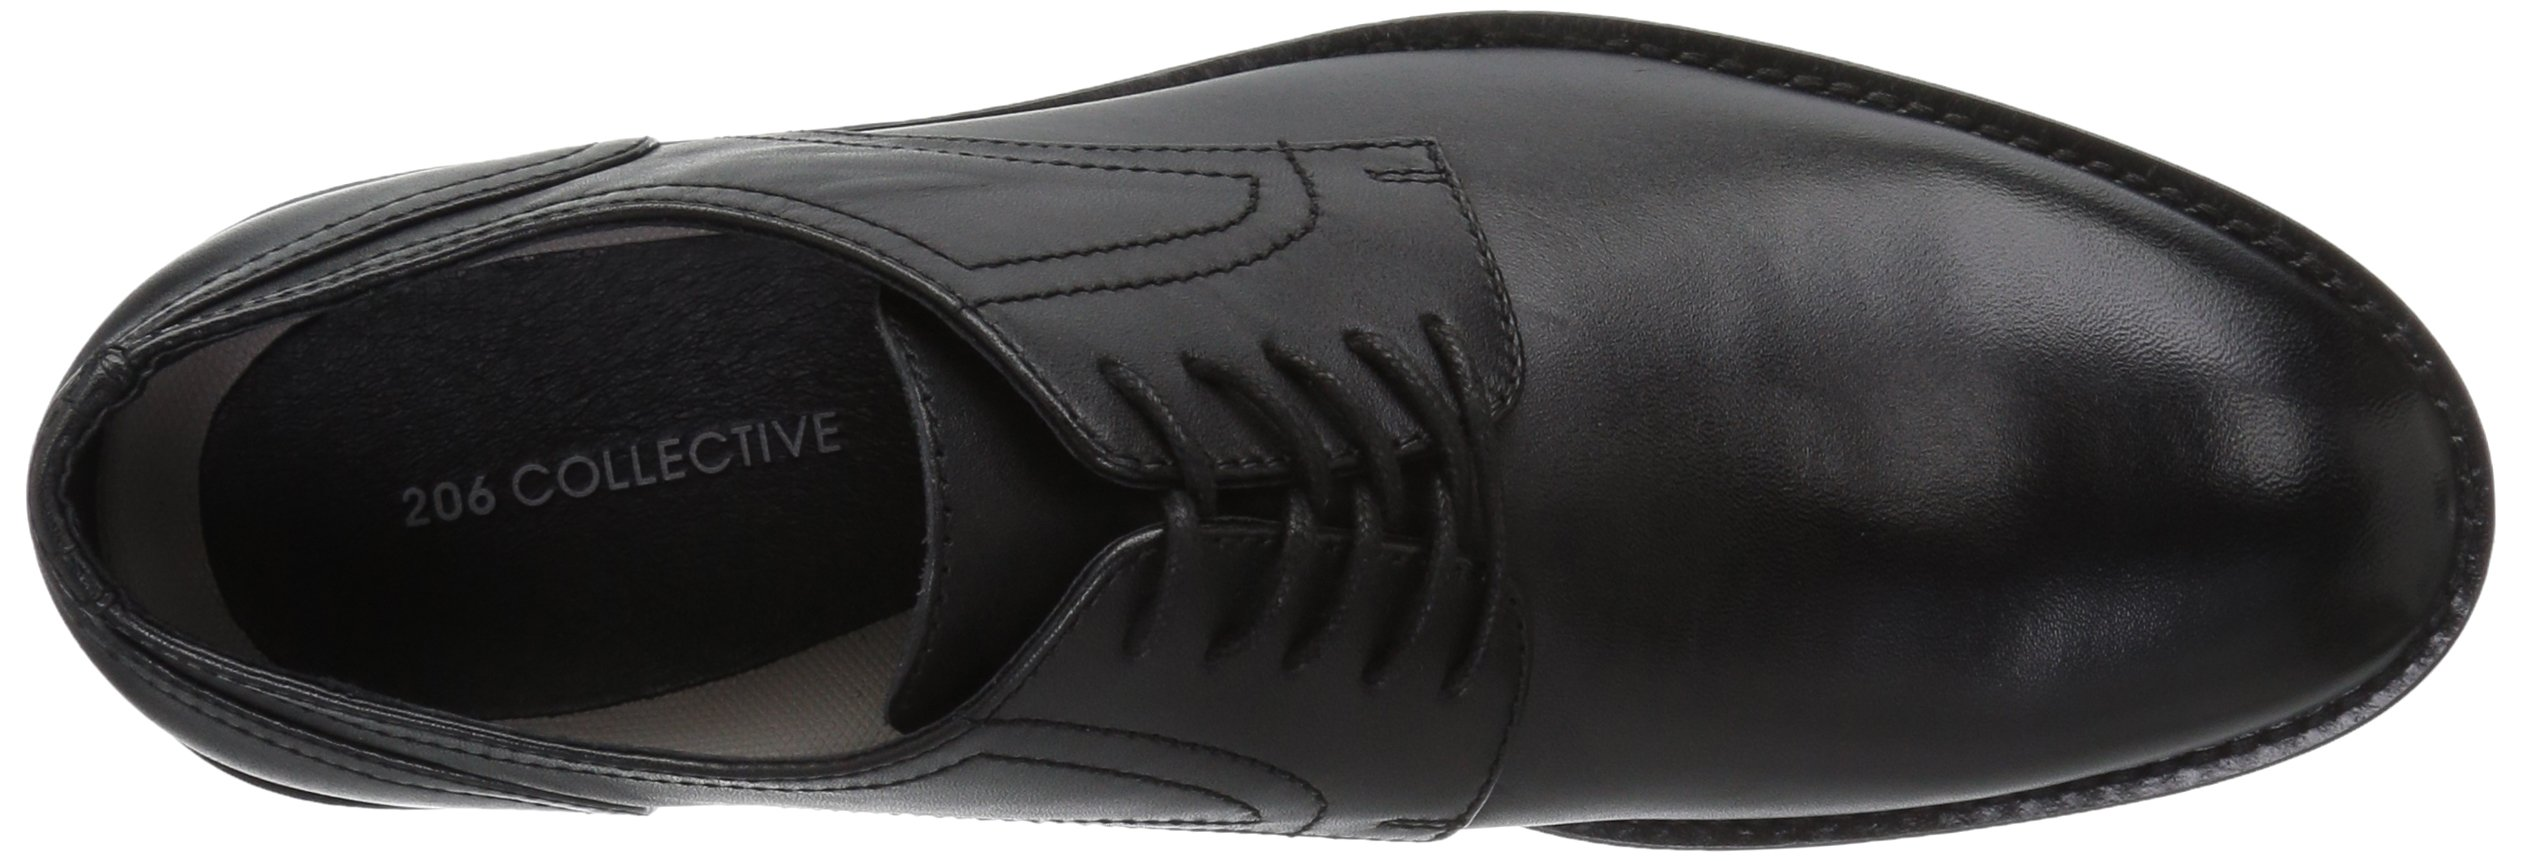 206 Collective Men's Concord Plain-Toe Oxford Shoe, Black, 13 2E US by 206 Collective (Image #8)